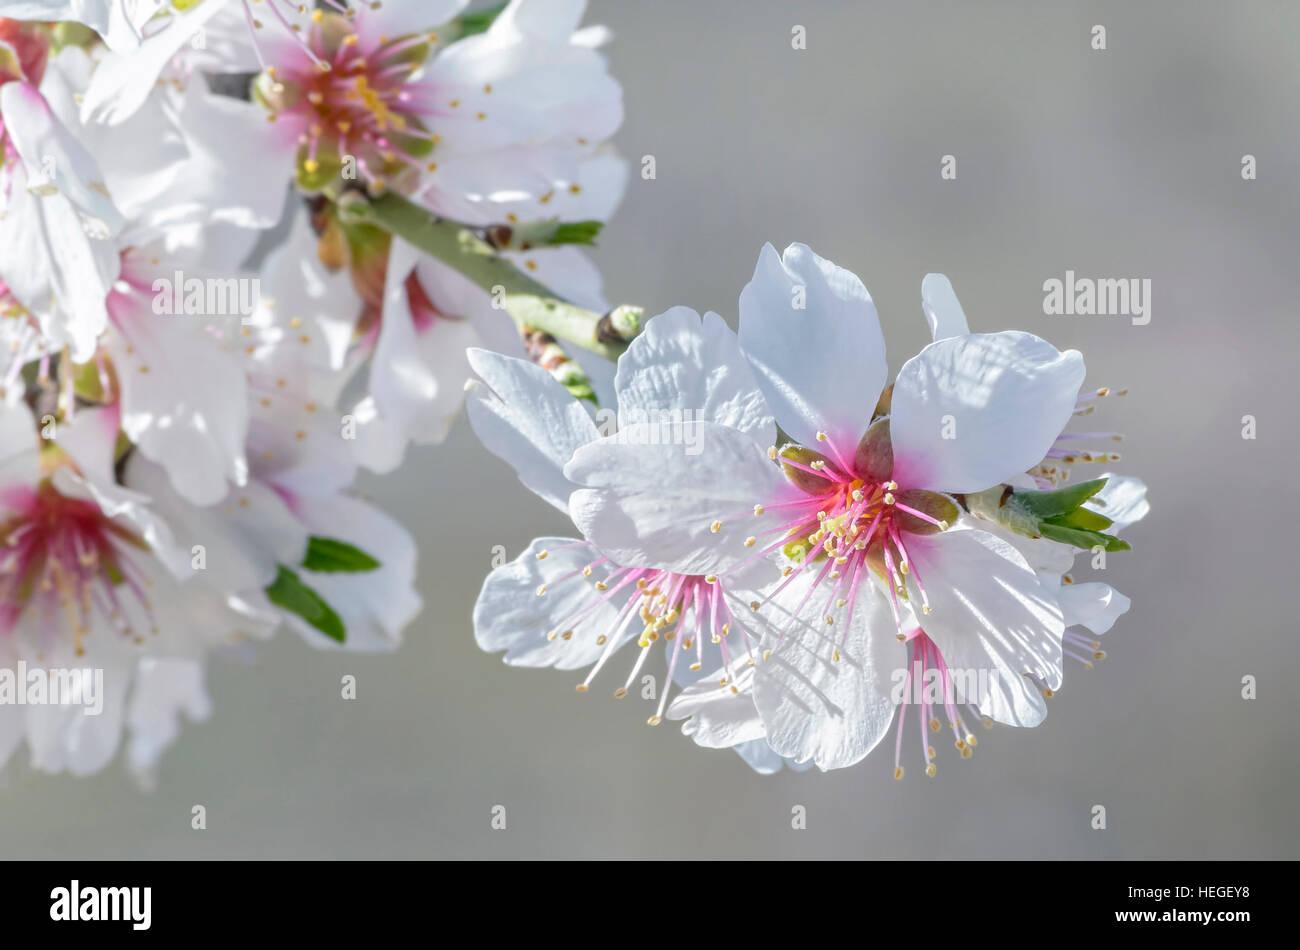 Prunus Dulcis Primavera De Fondo Flor De Almendro Hermosas Flores